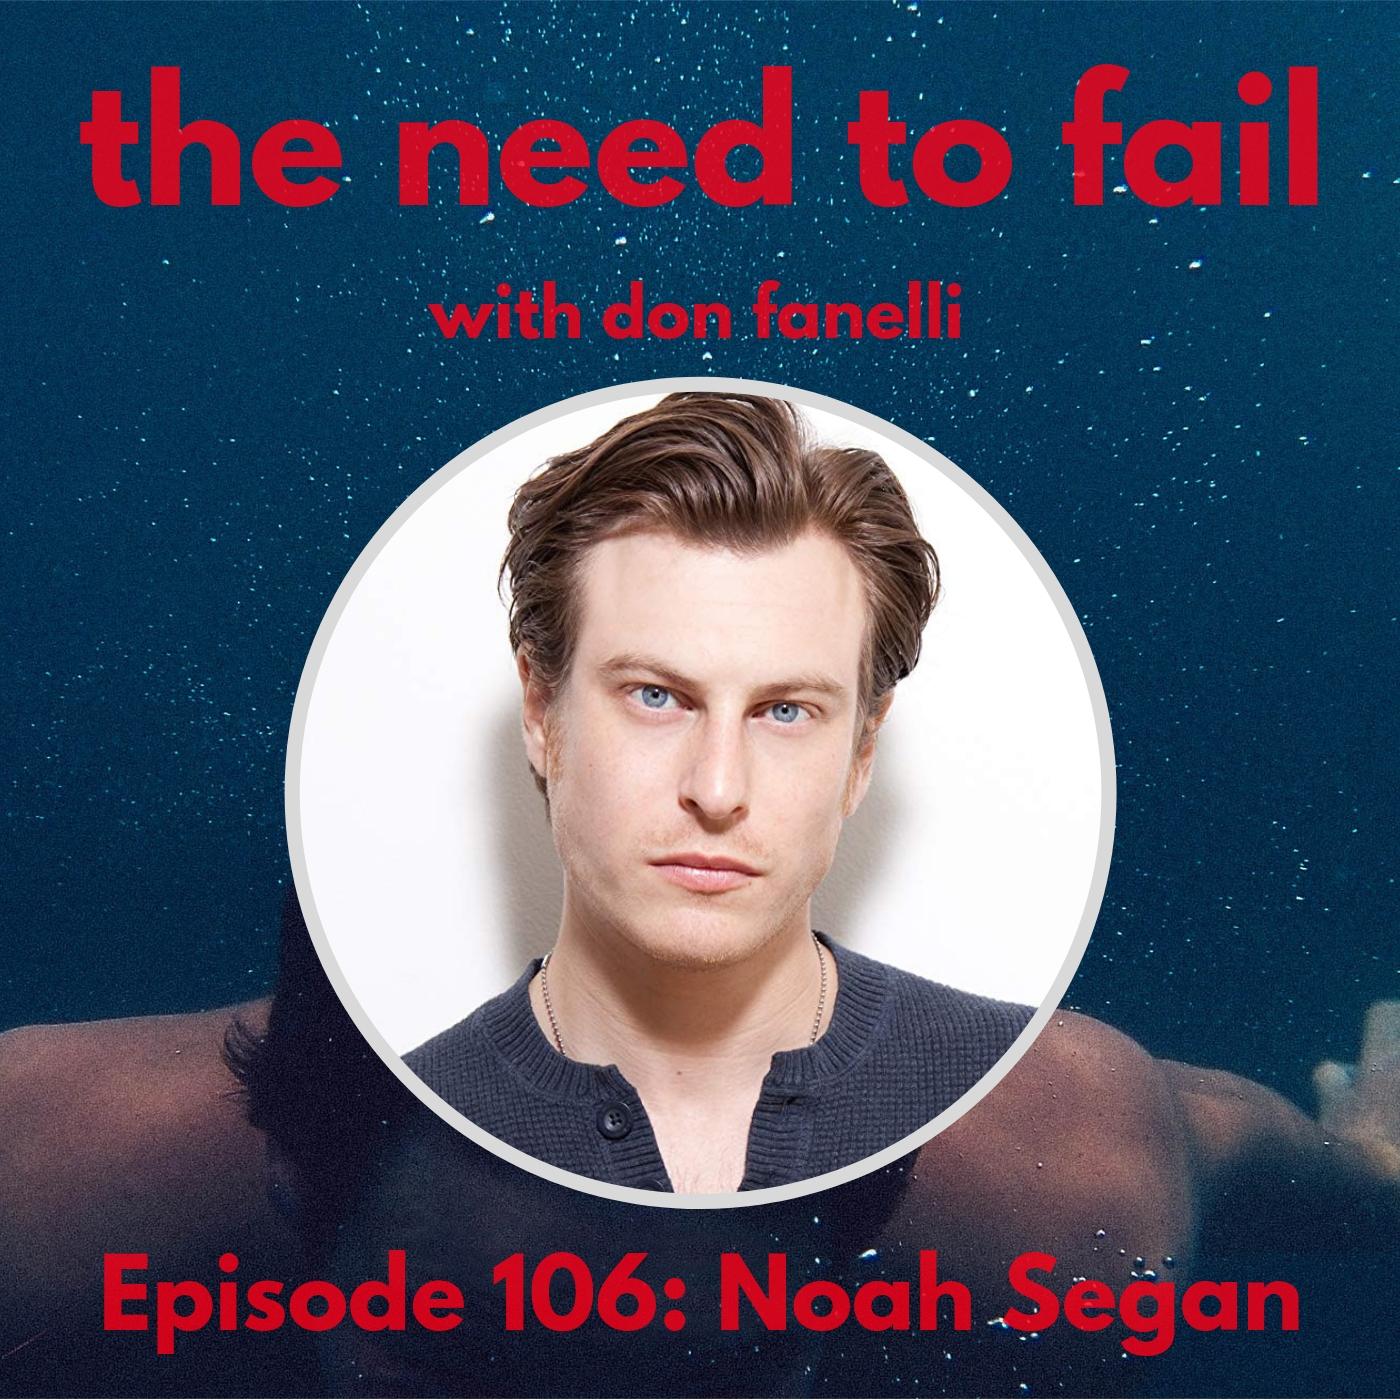 Episode 106: Noah Segan